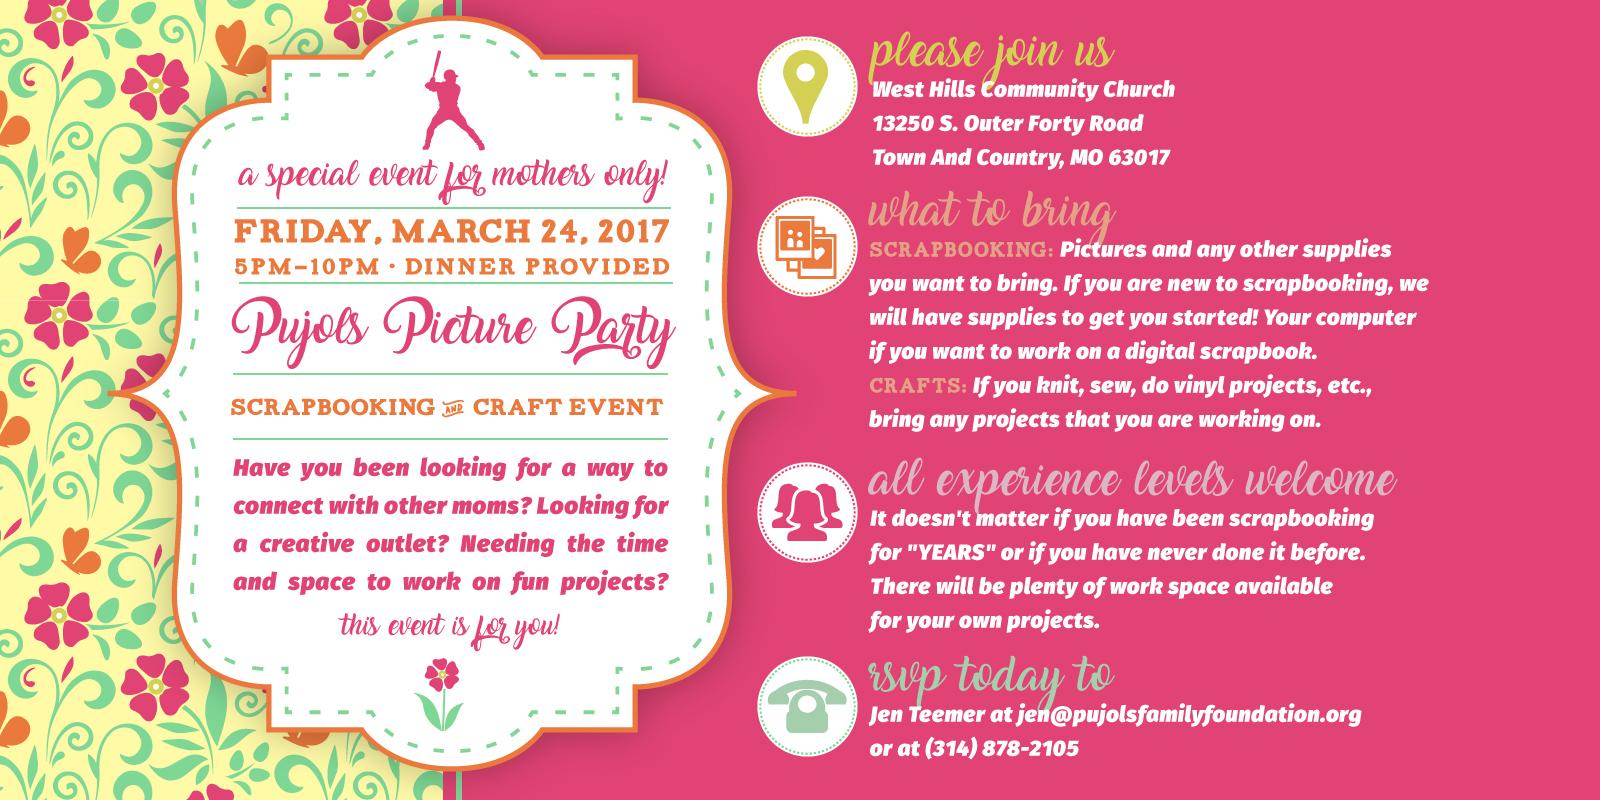 2017 Pujols Picture Party Invitation